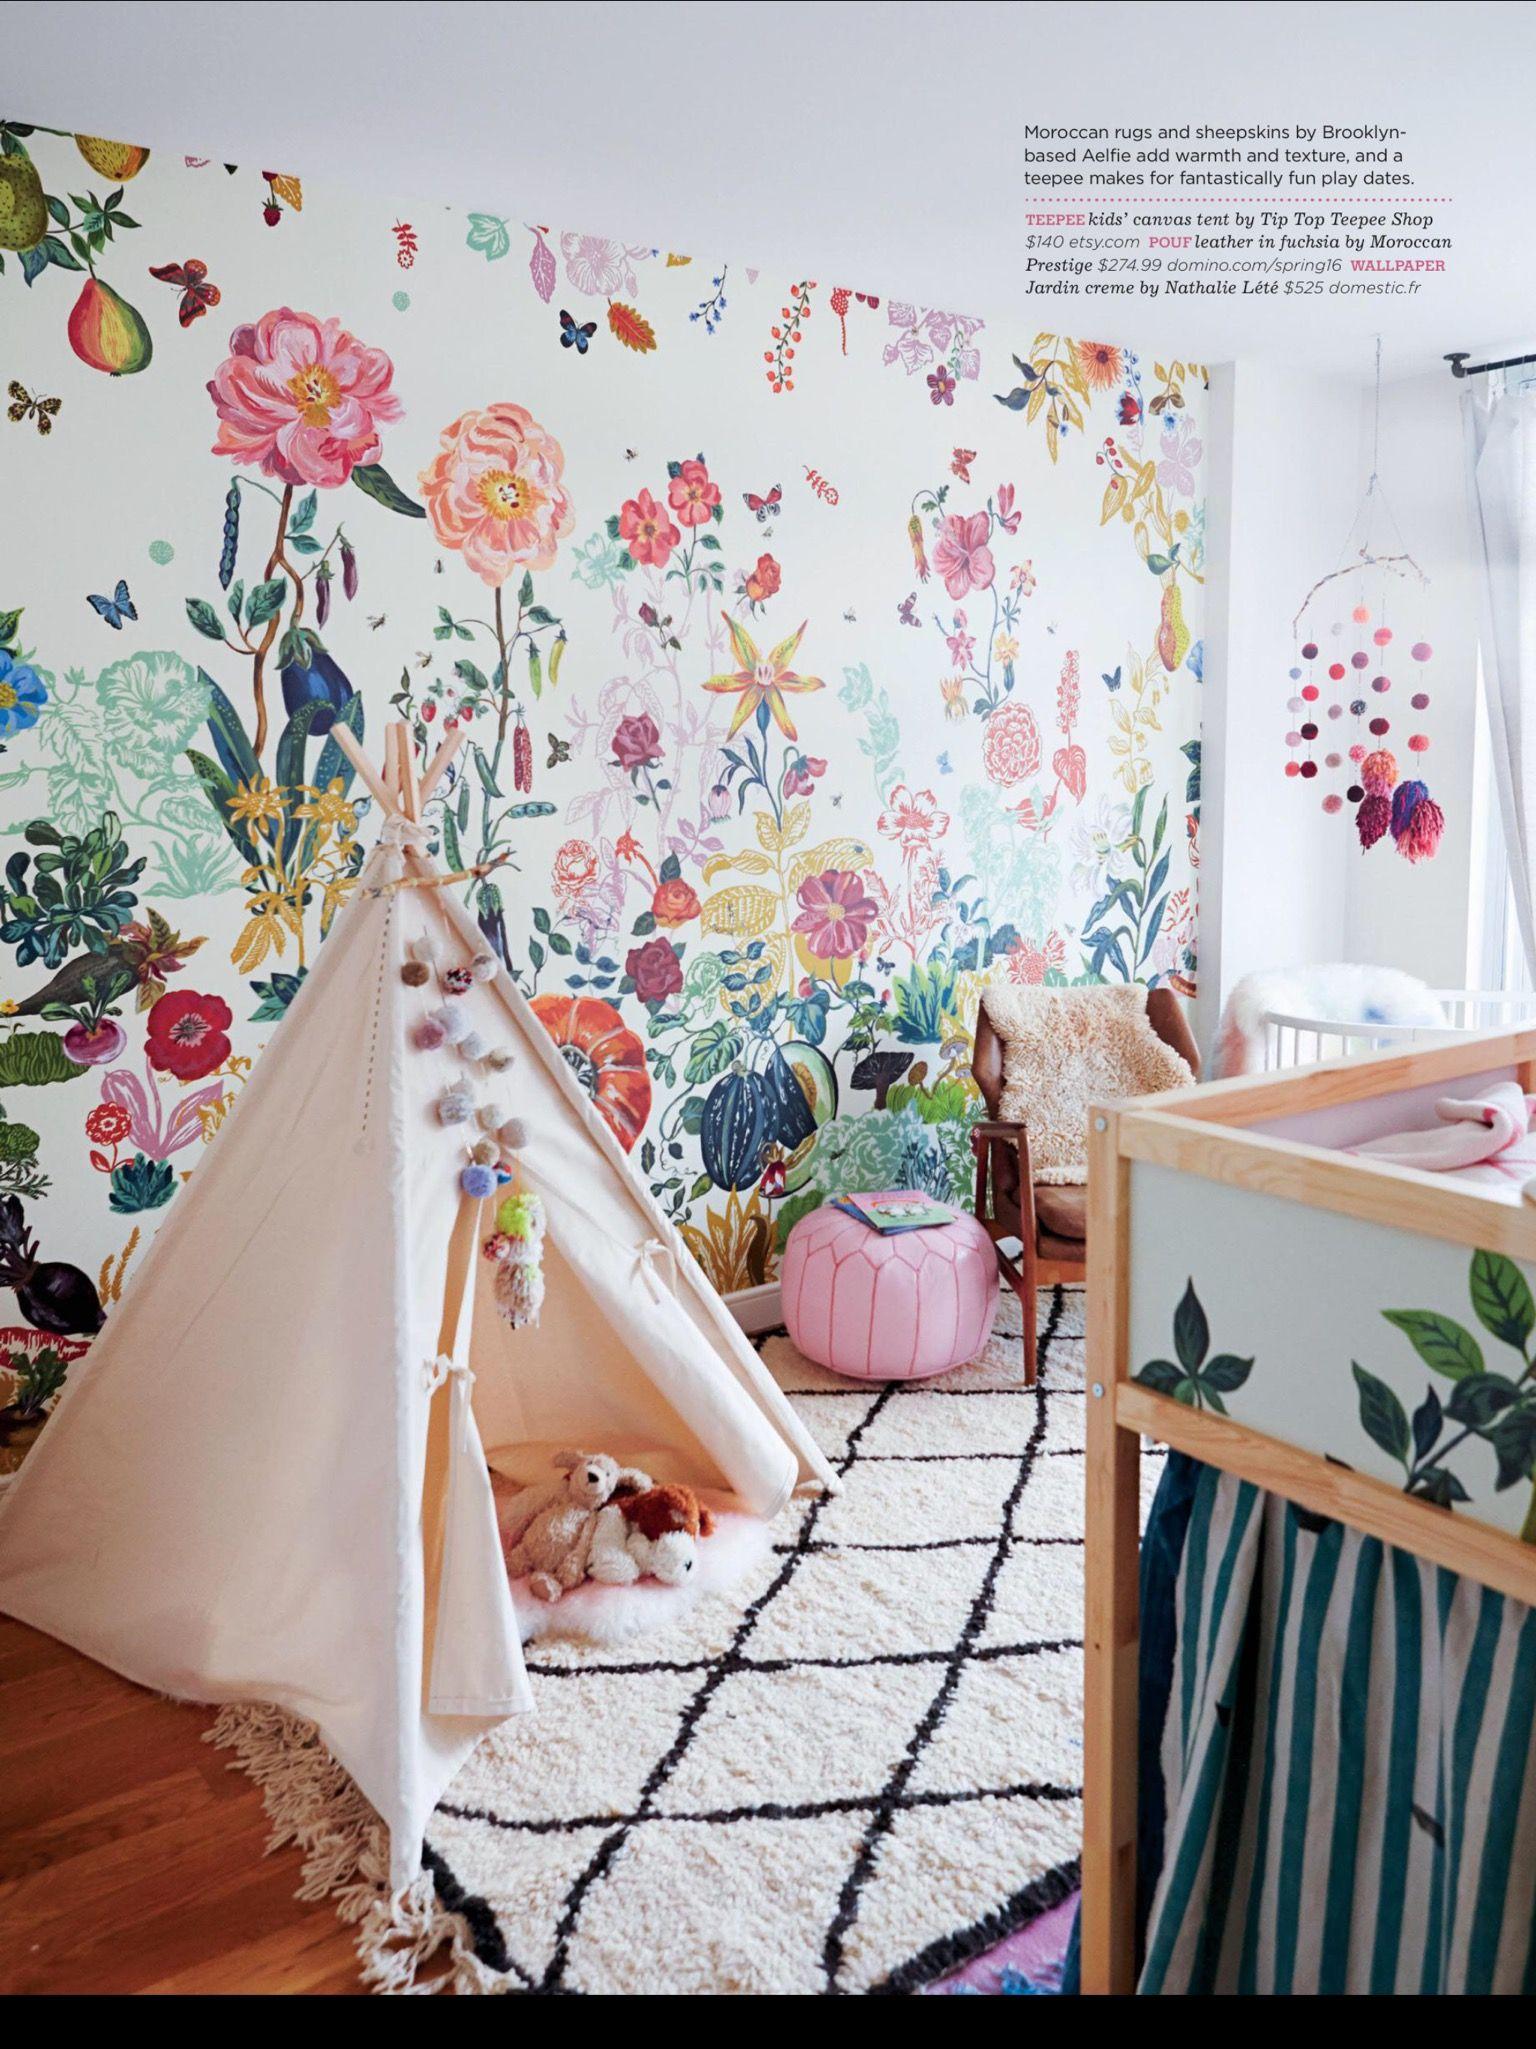 Stokke Sleepi mini crib in white spotting in this colorful eclectic